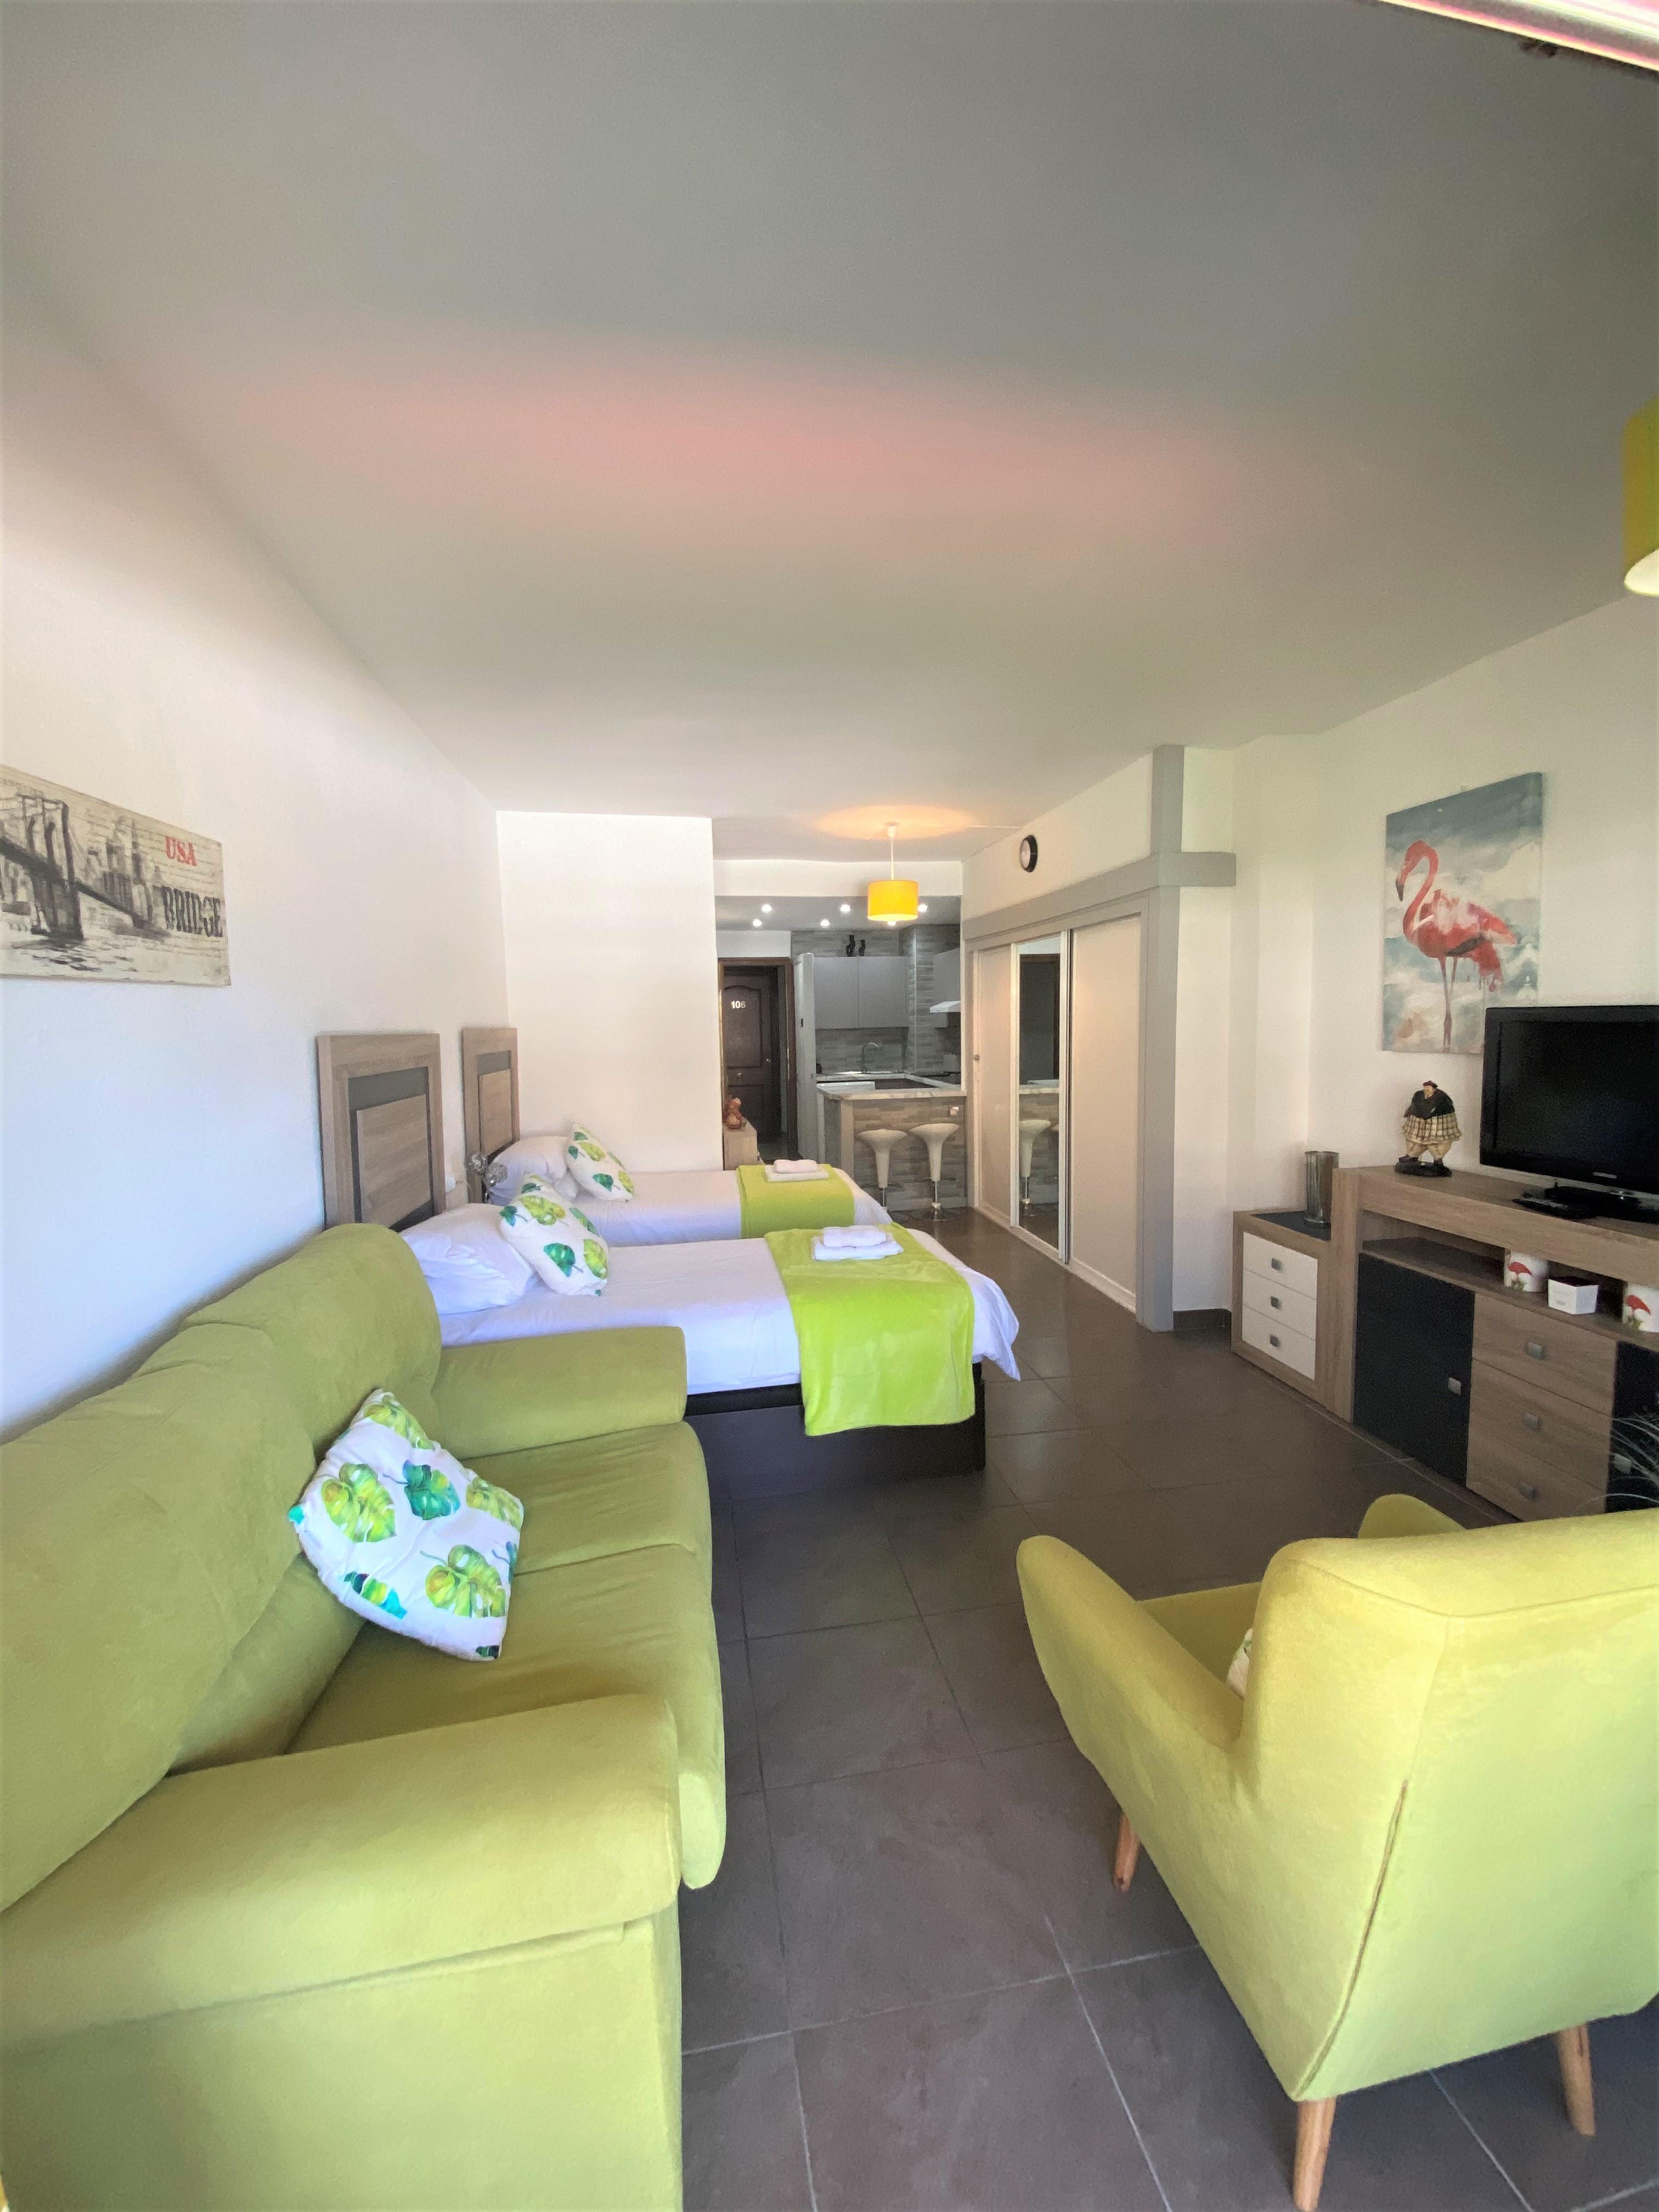 Qlistings - Studio apartment on Marbella's Golden Mile Property Image